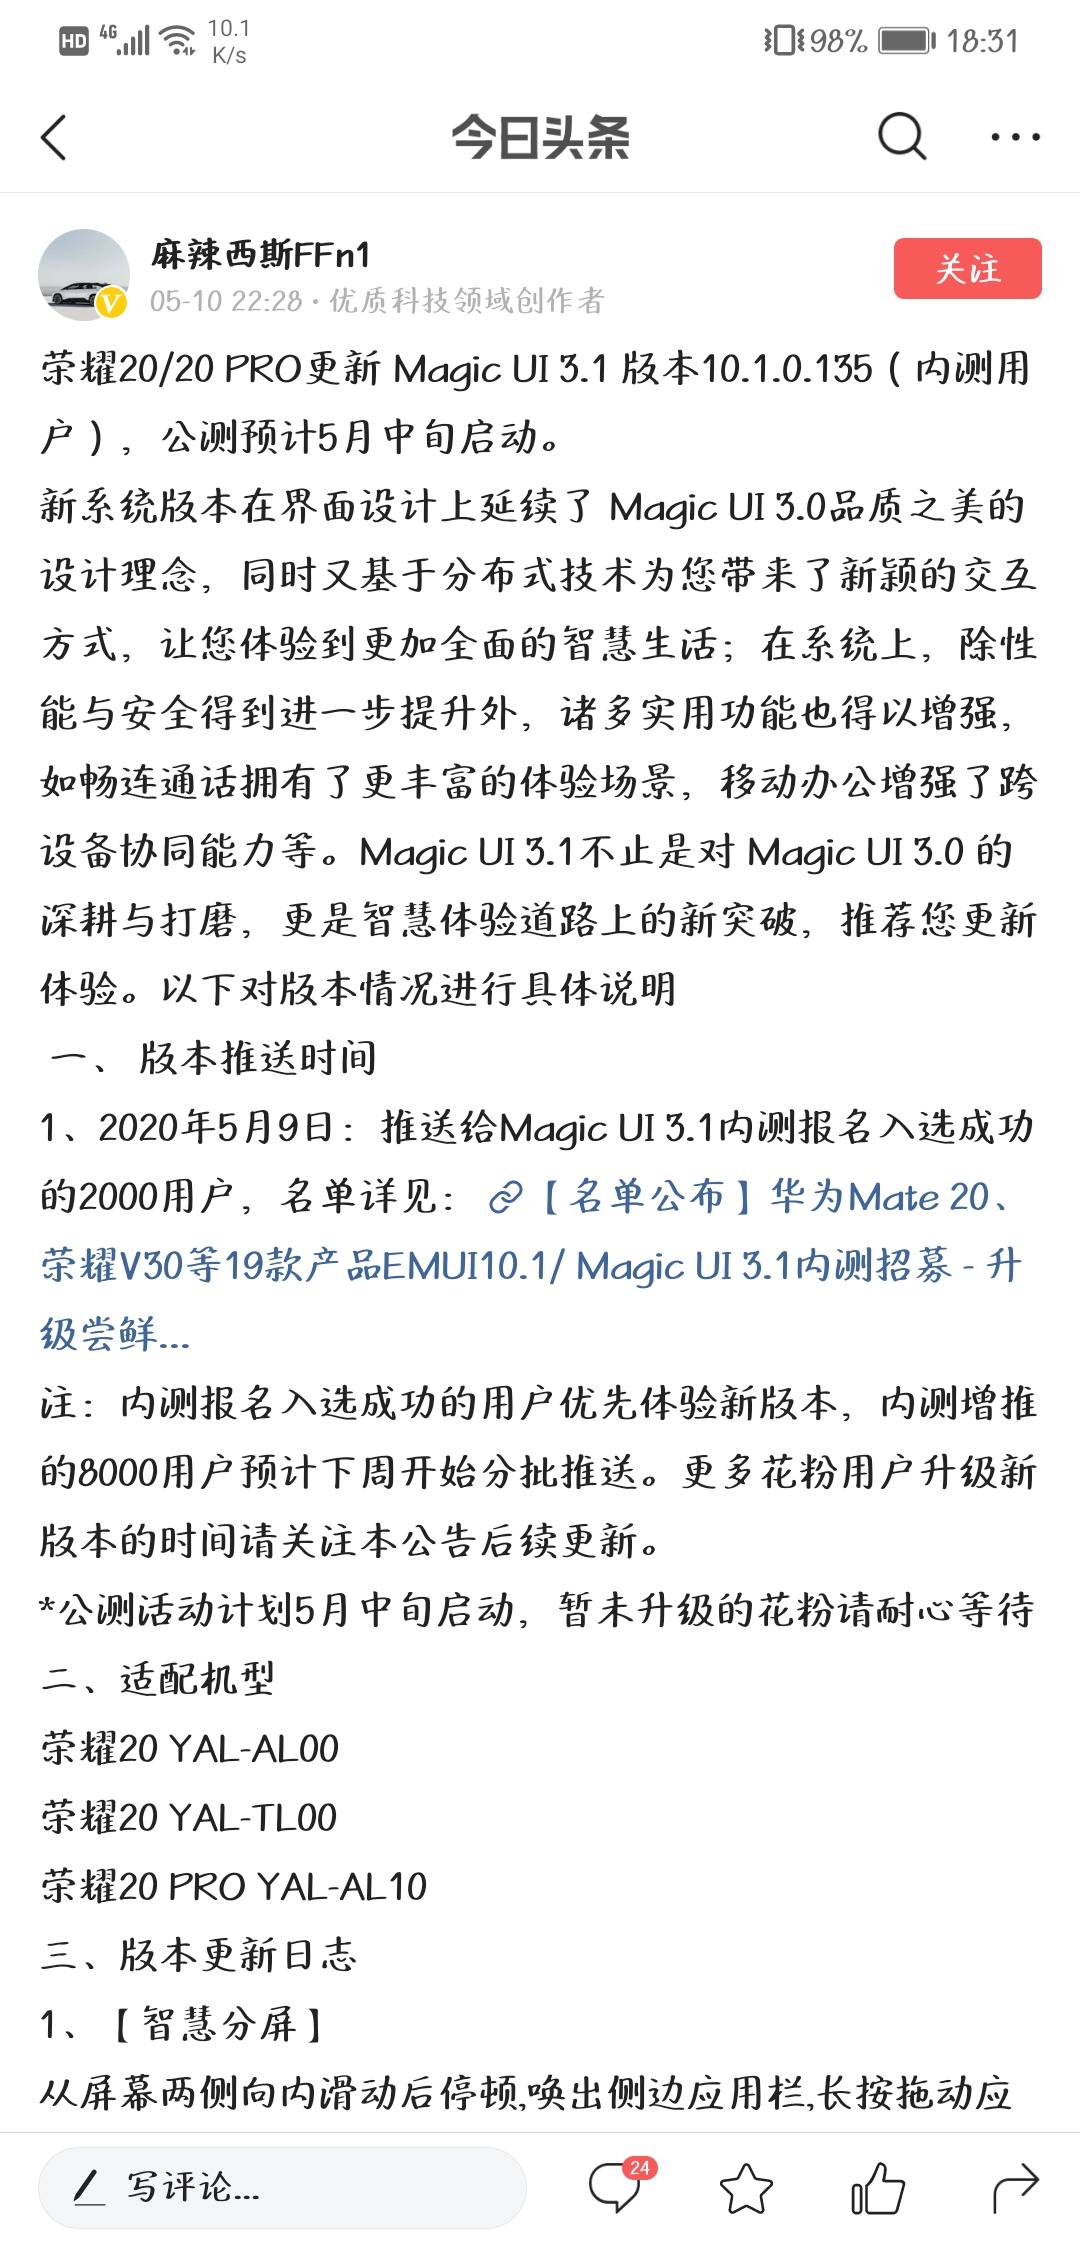 Screenshot_20200511_183108_com.ss.android.article.news.jpg